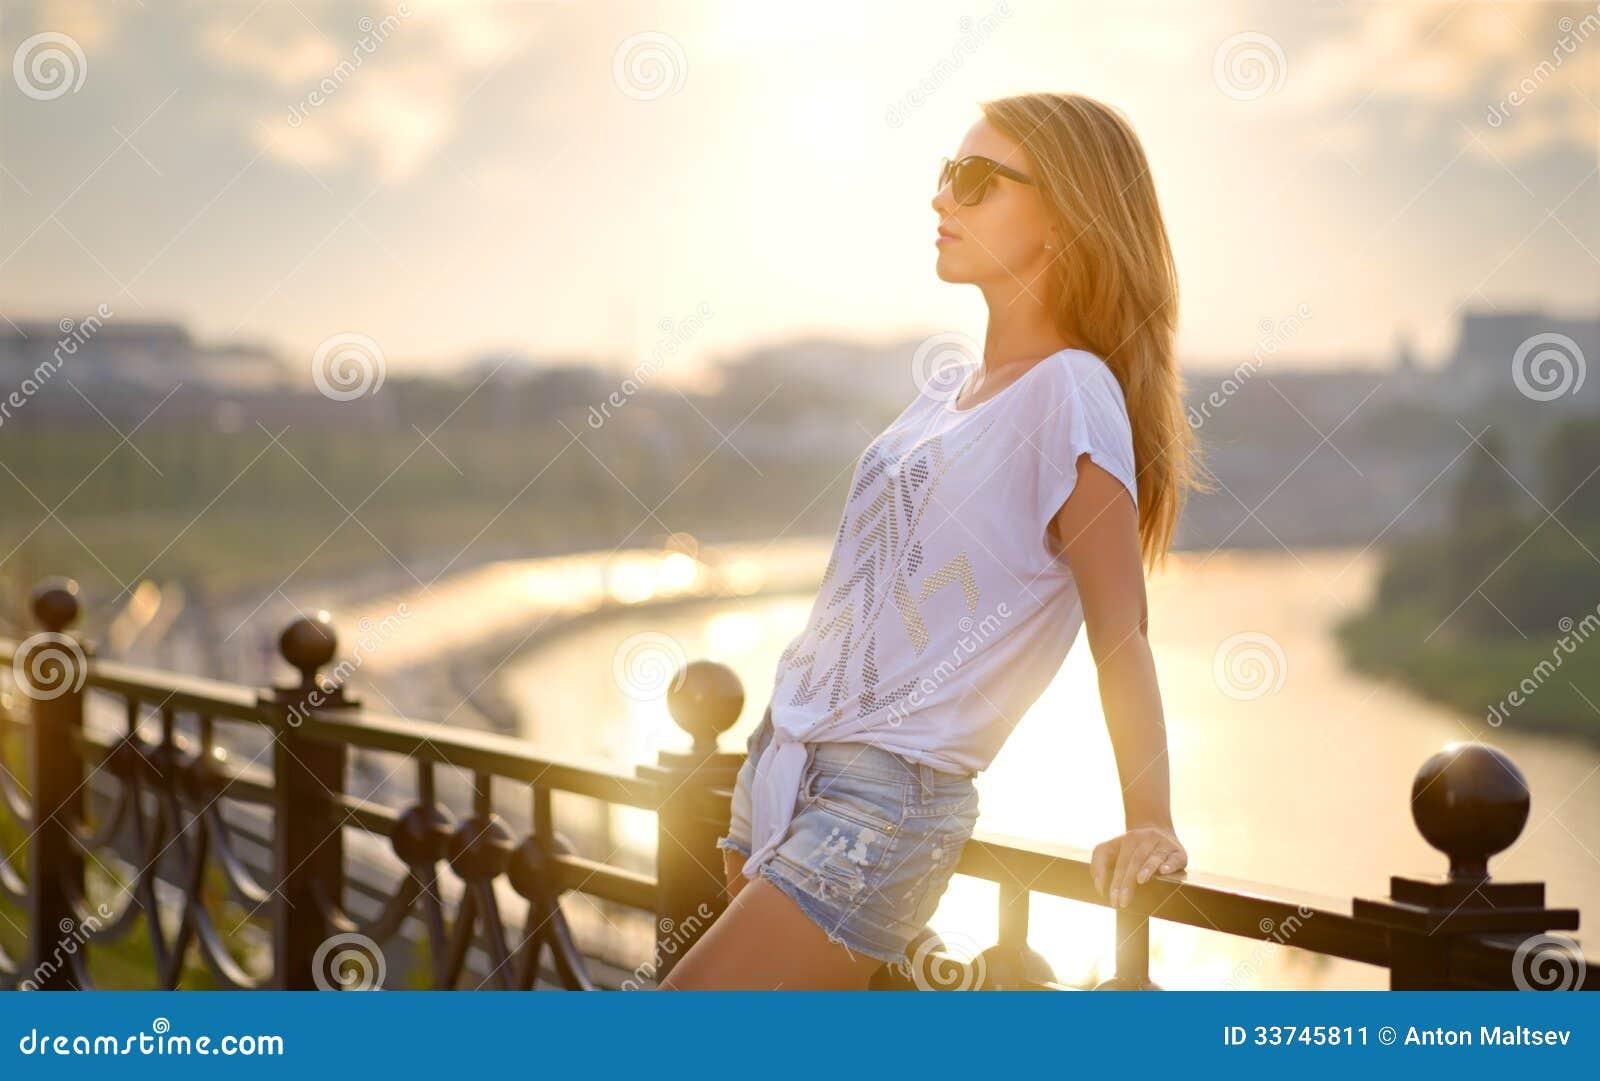 beautiful fashion girl in sunglasses